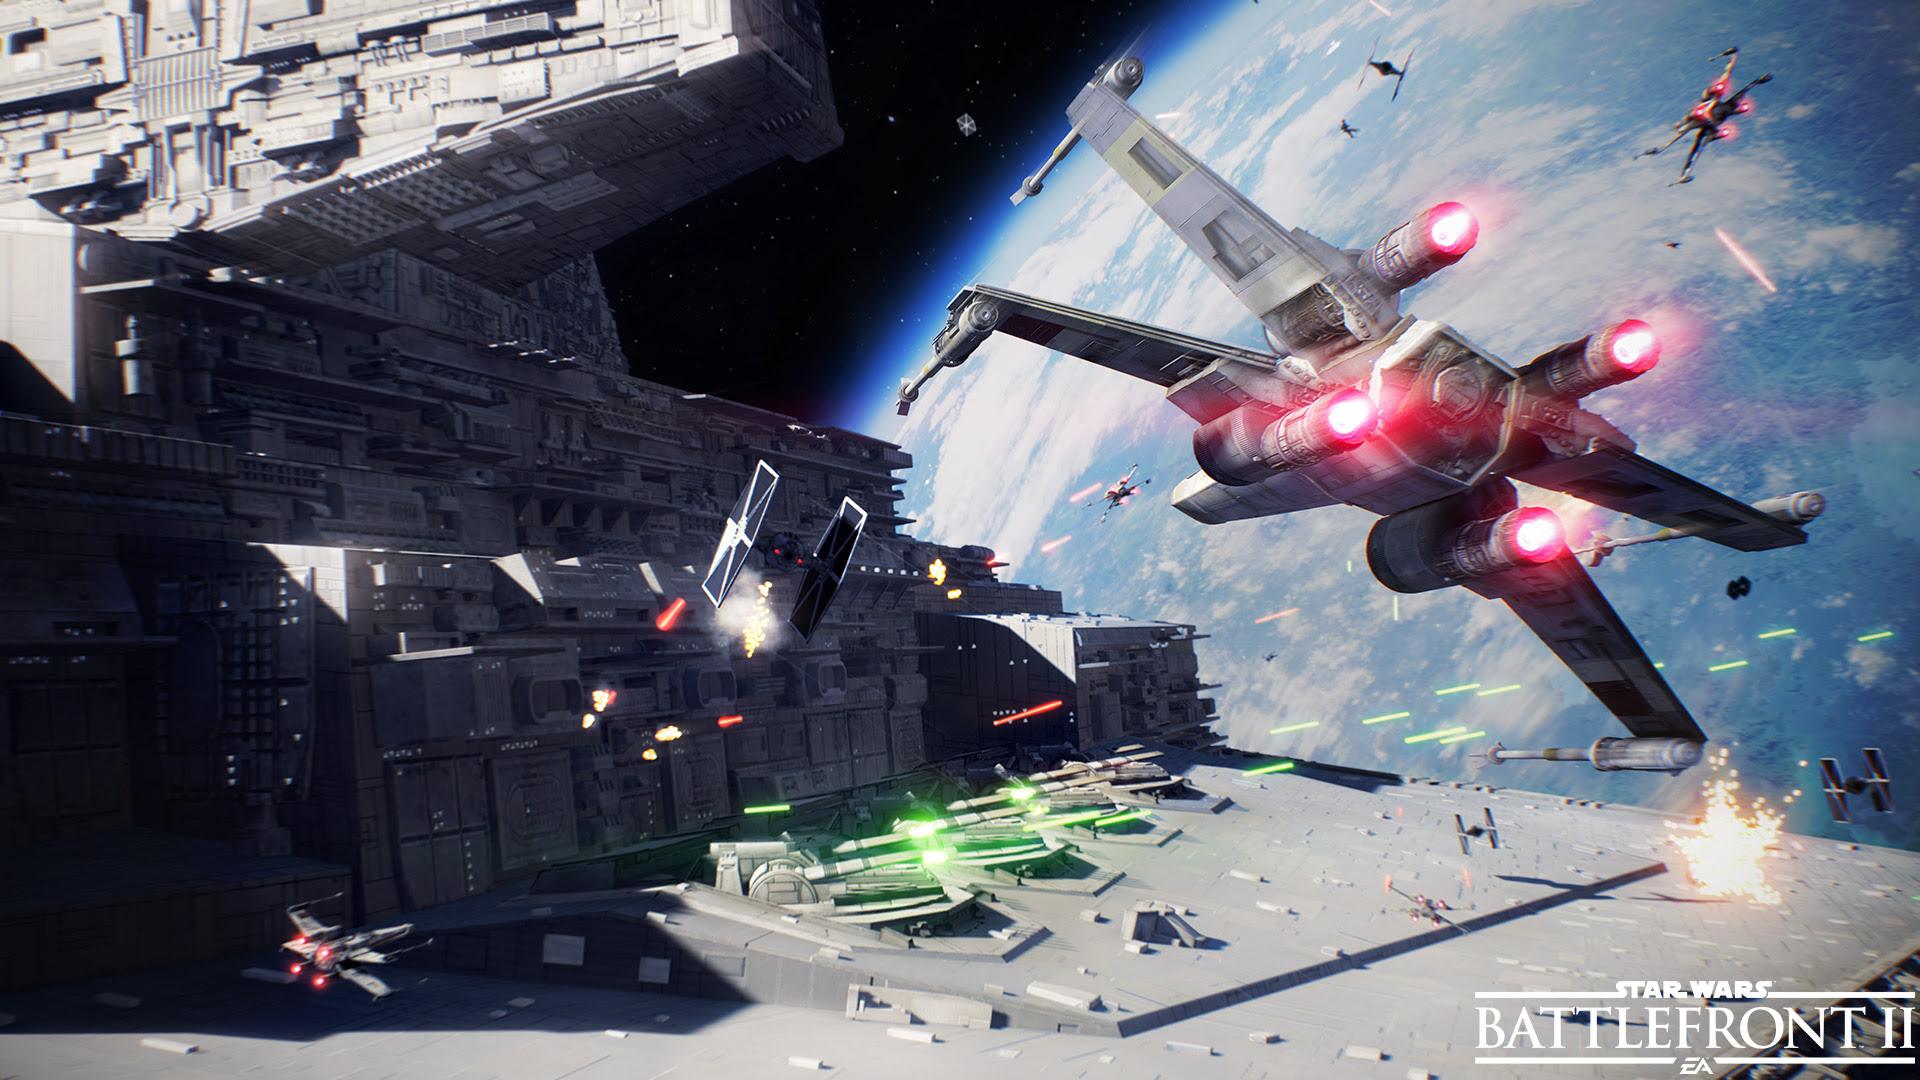 Star Wars Battlefront 2 Wallpaper Movies Free Hd Watch Online Play